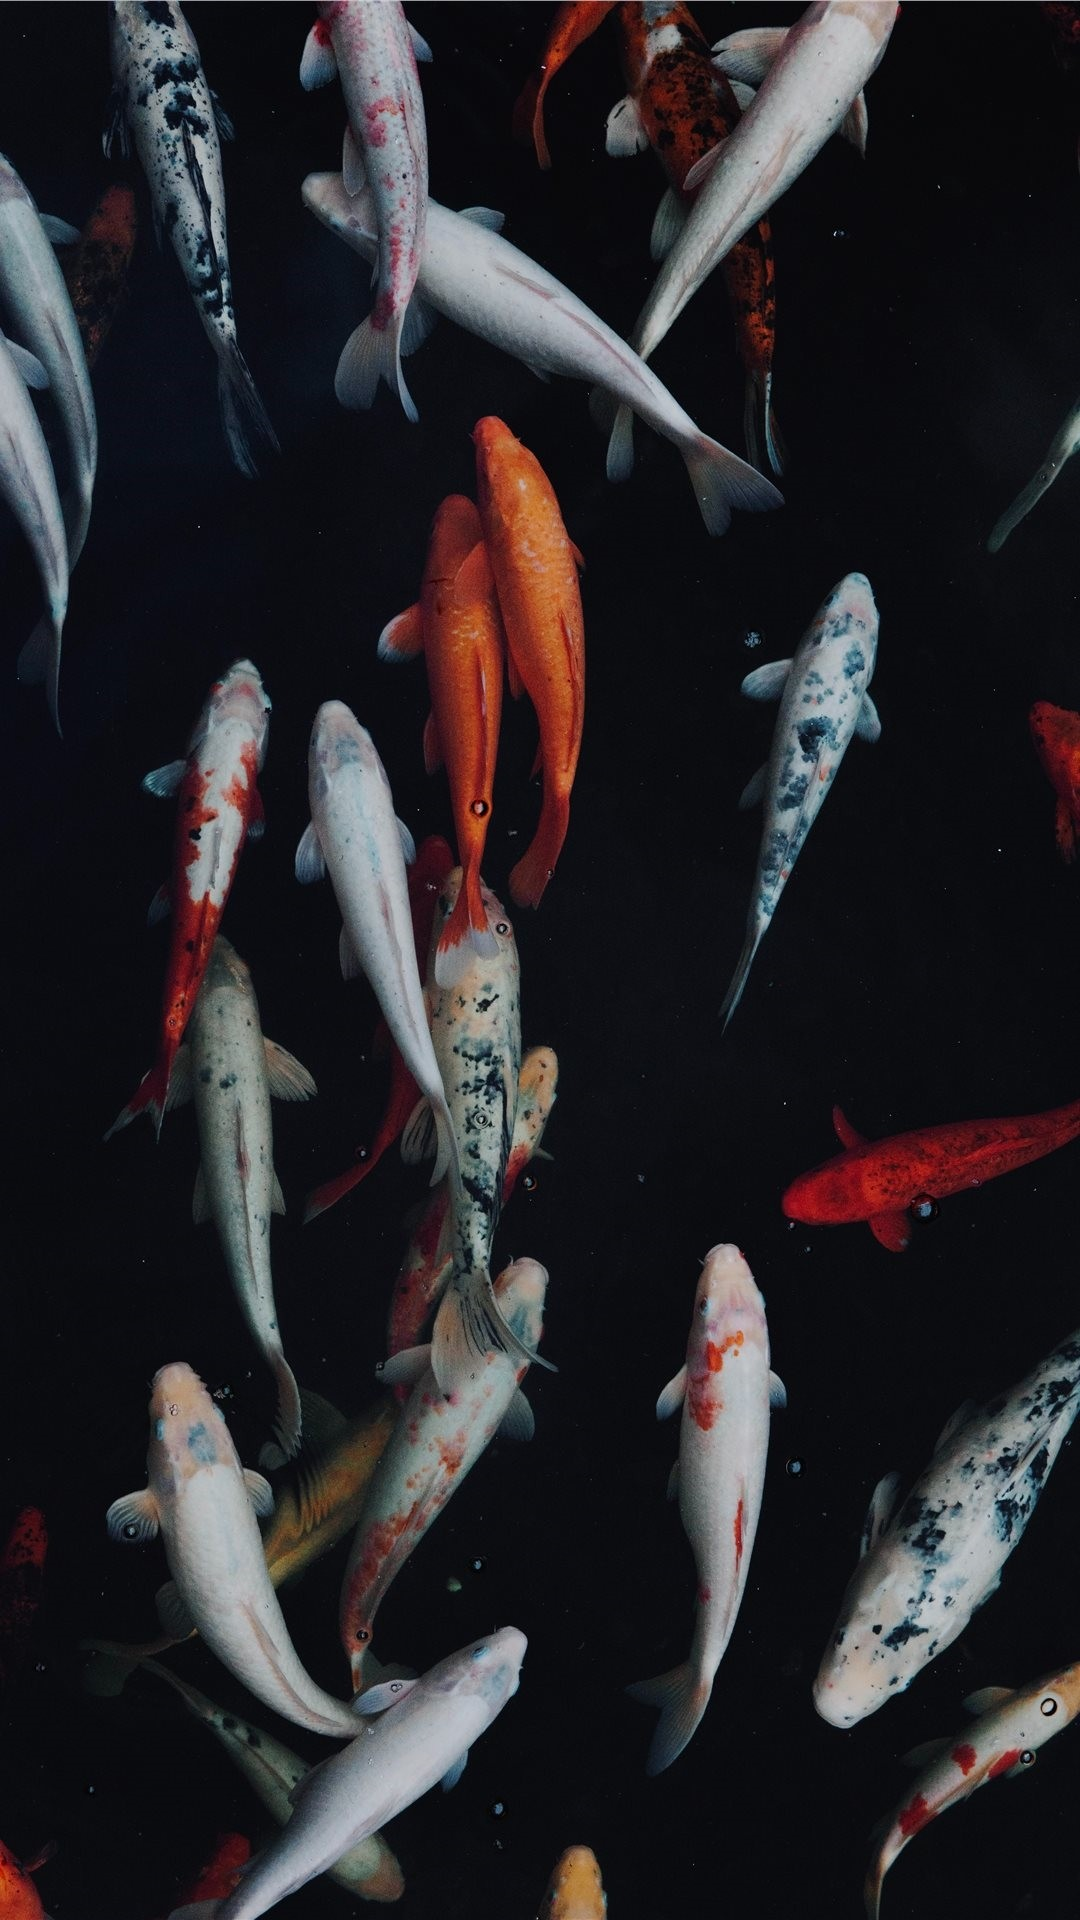 Koi Fish iphone wallpaper high quality